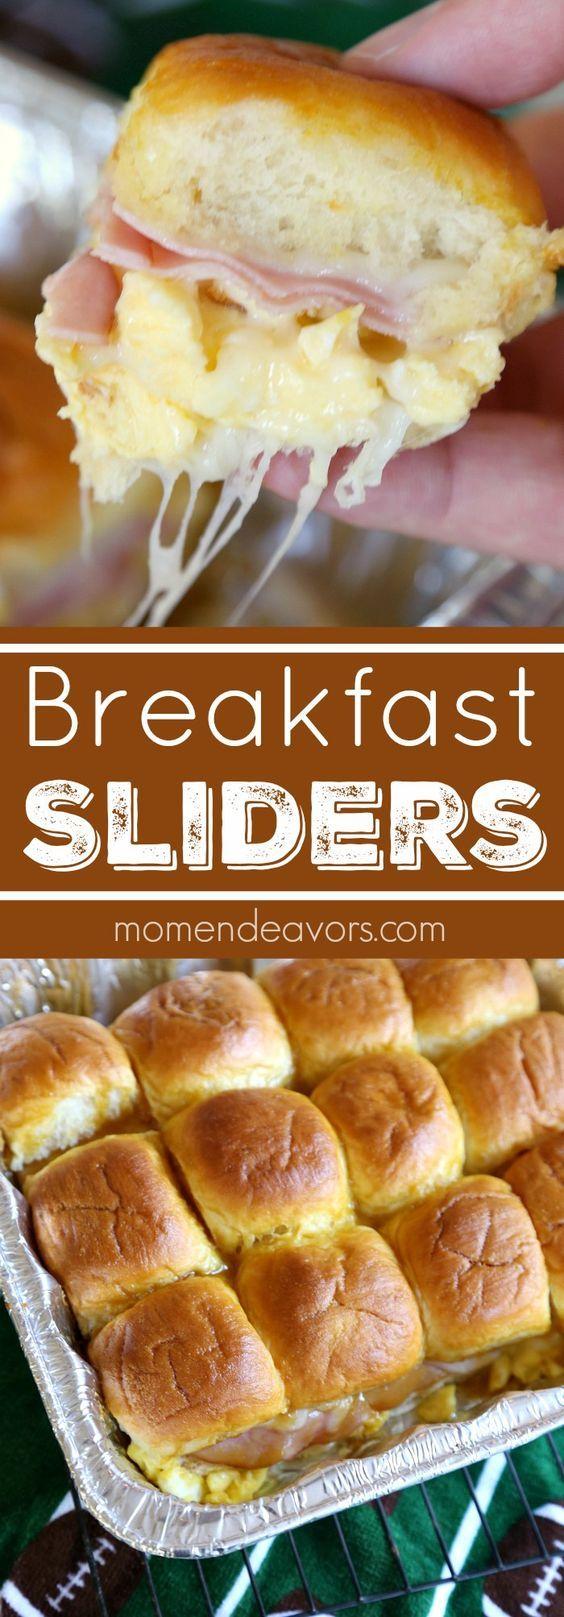 Ham, Egg, & Cheese Breakfast Sliders  - perfect for gameday breakfast tailgates!